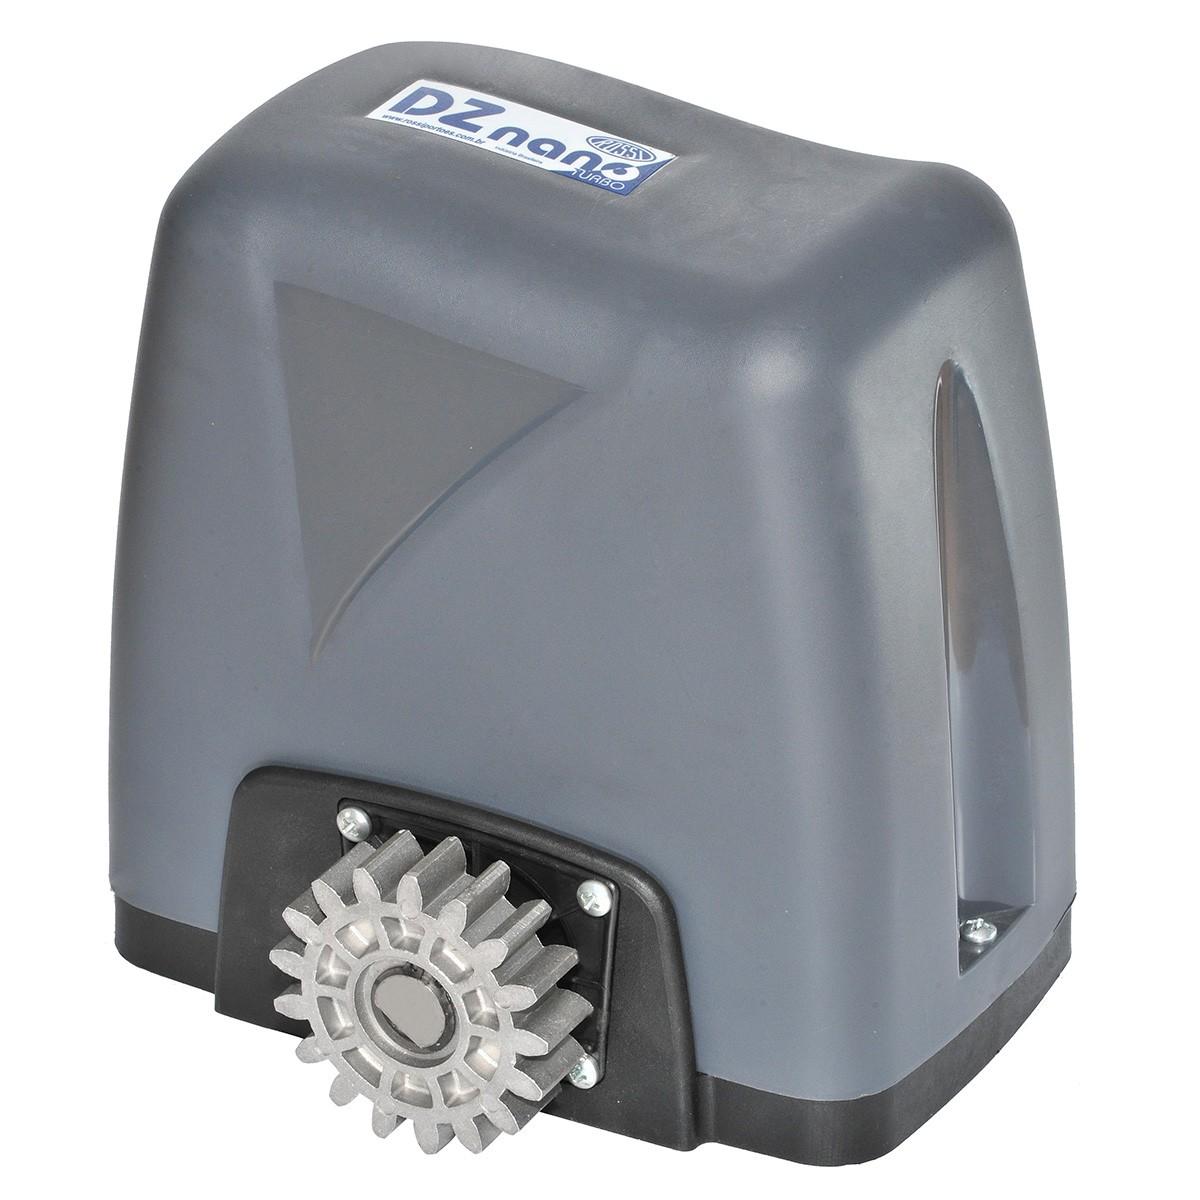 Motor Rossi Dz Nano Turbo Sem Cremalheira 2 Controles 110v 600kg